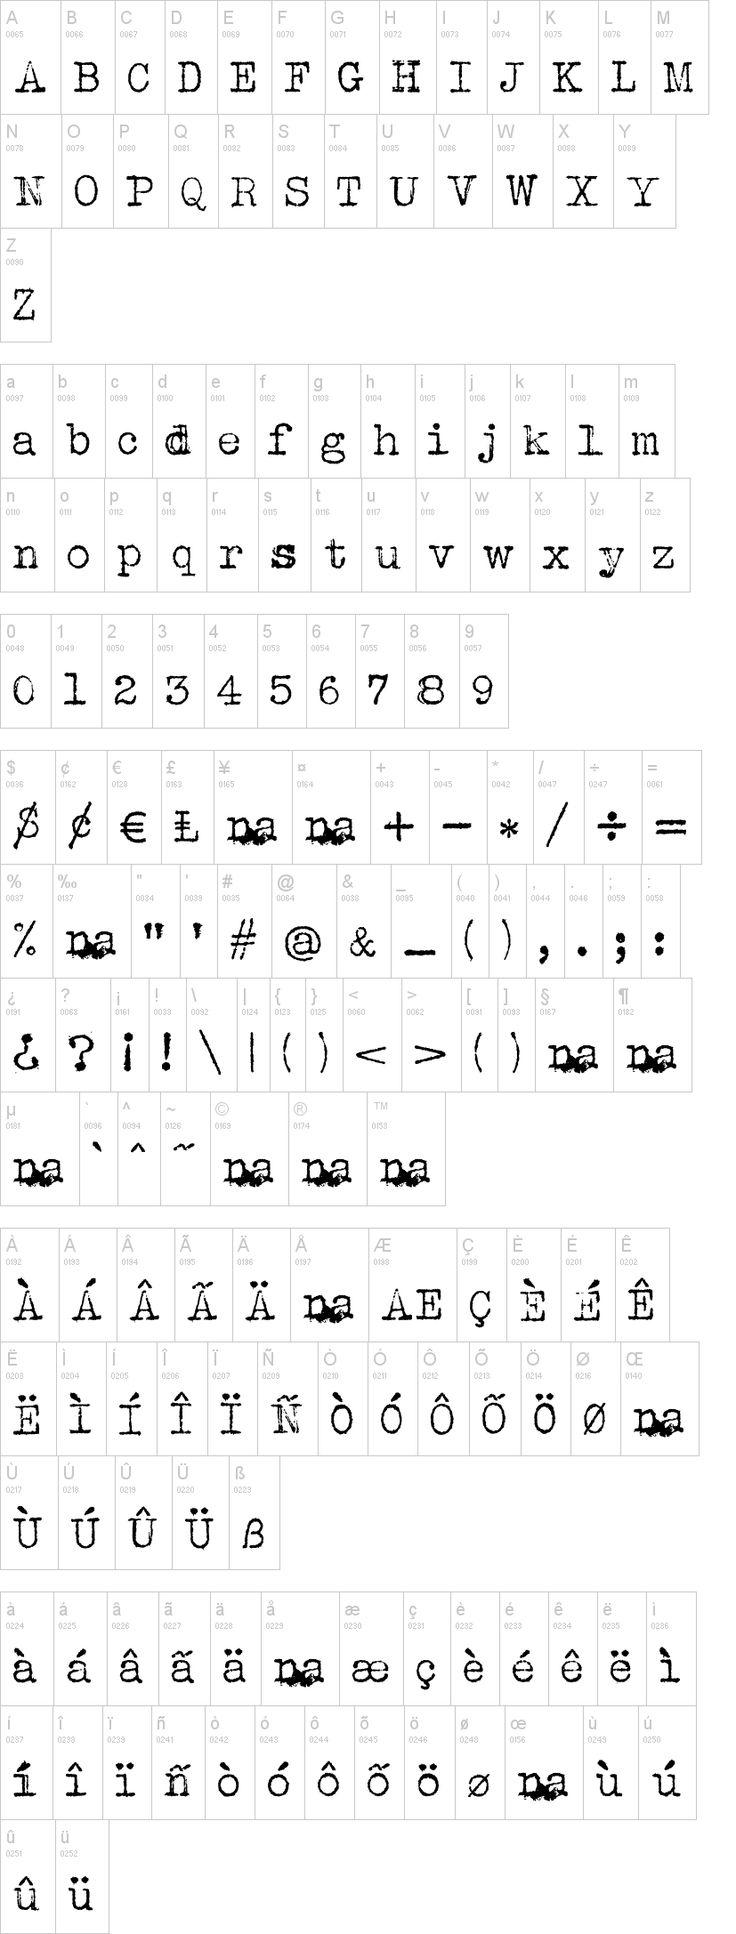 fonte Albertsthal Typewriter - máquina de escrever